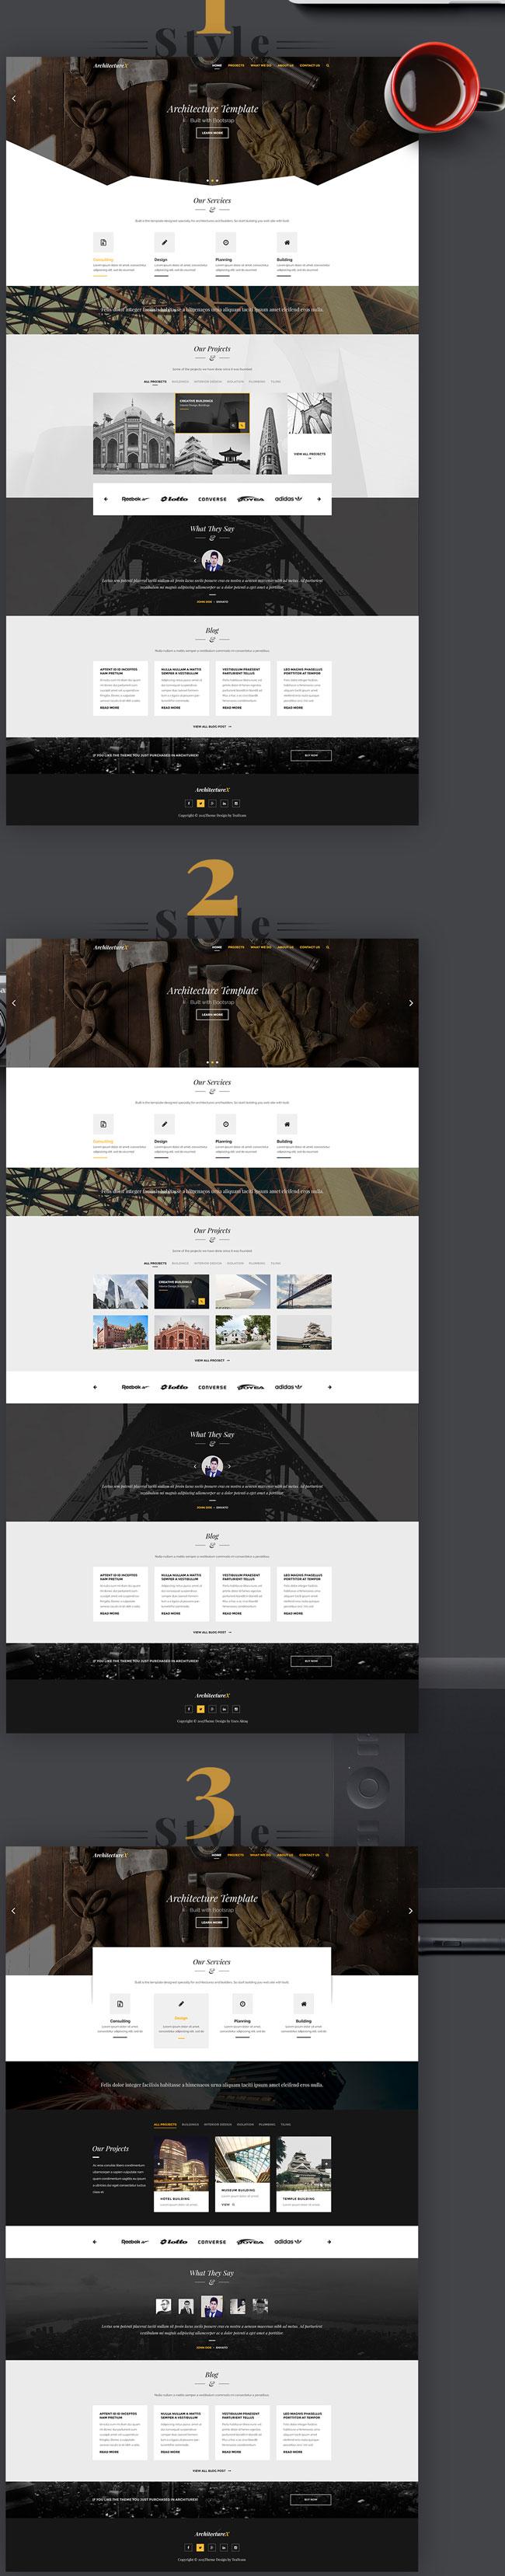 ArchitectureX - Free PSD Architecture Landing Page Template